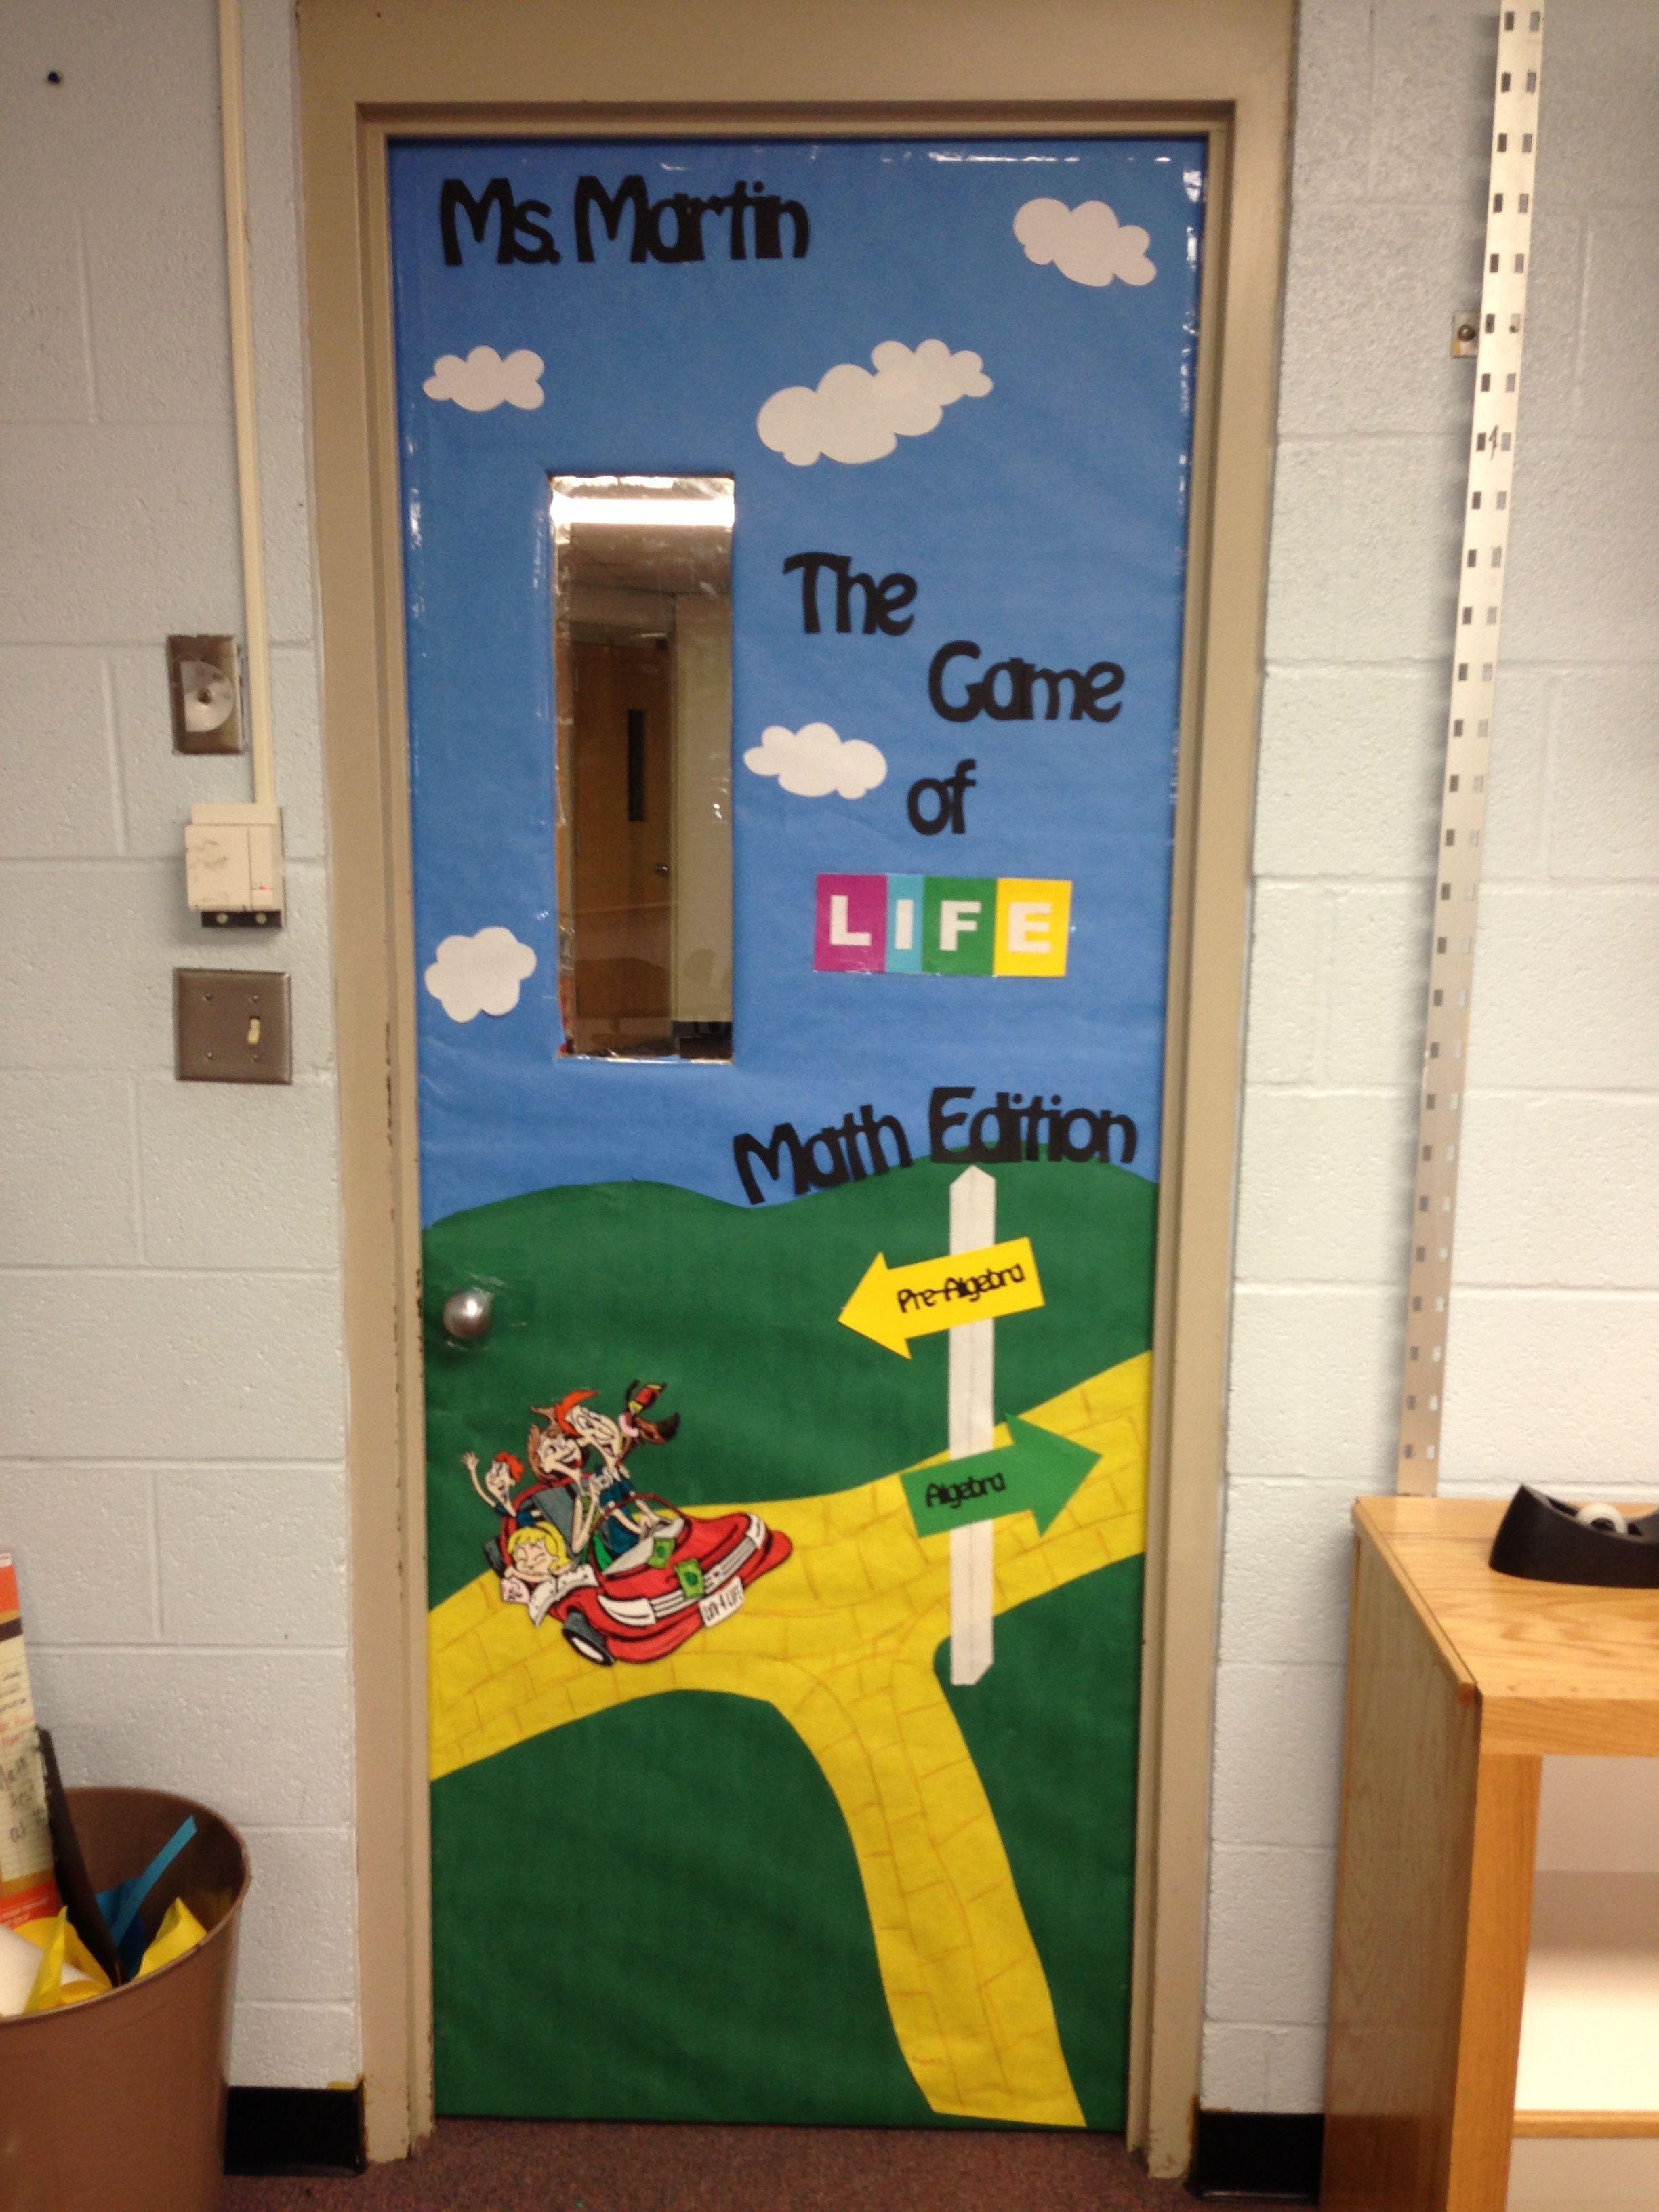 Math Classroom Decoration ~ The game of life math edition door decoration